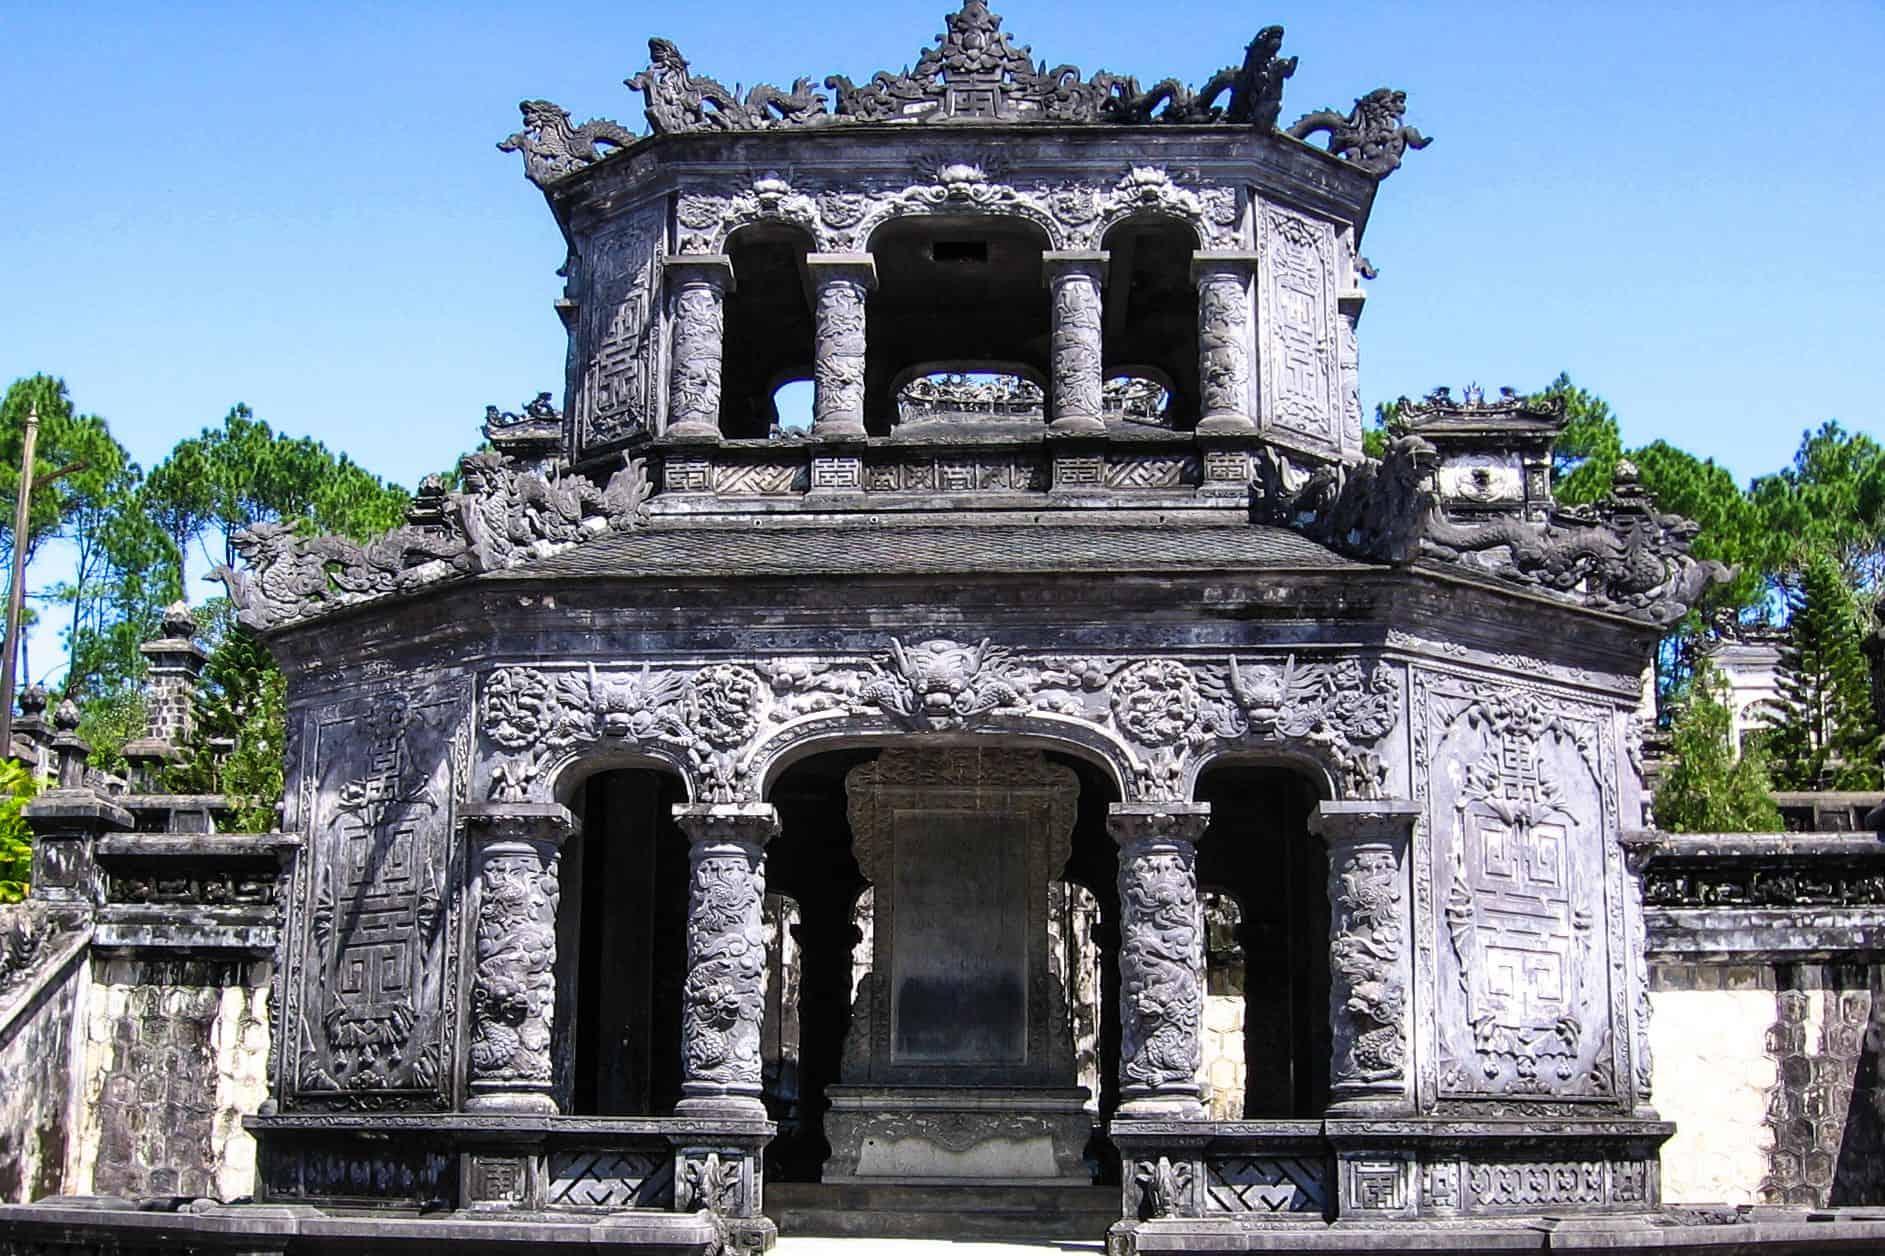 Architecture of Khai Dinh tomb